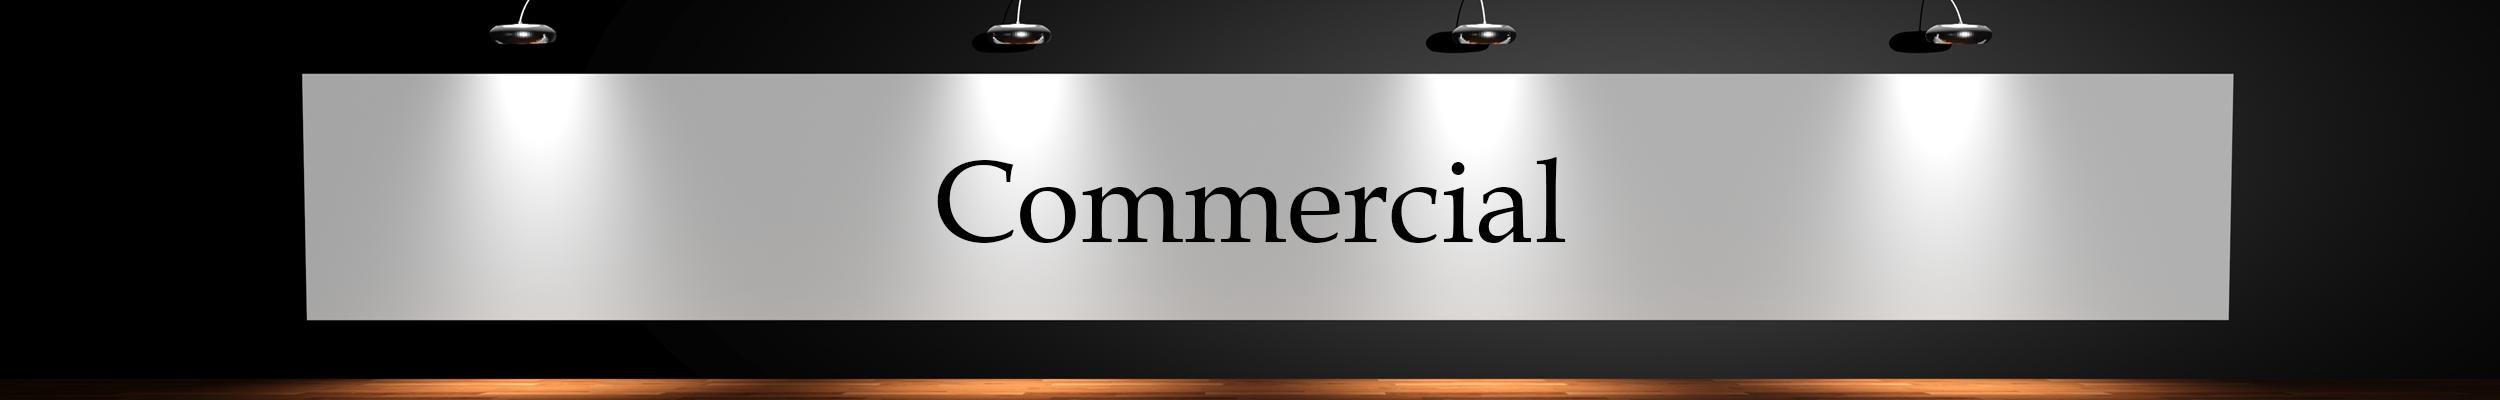 CommercialSliderFinal